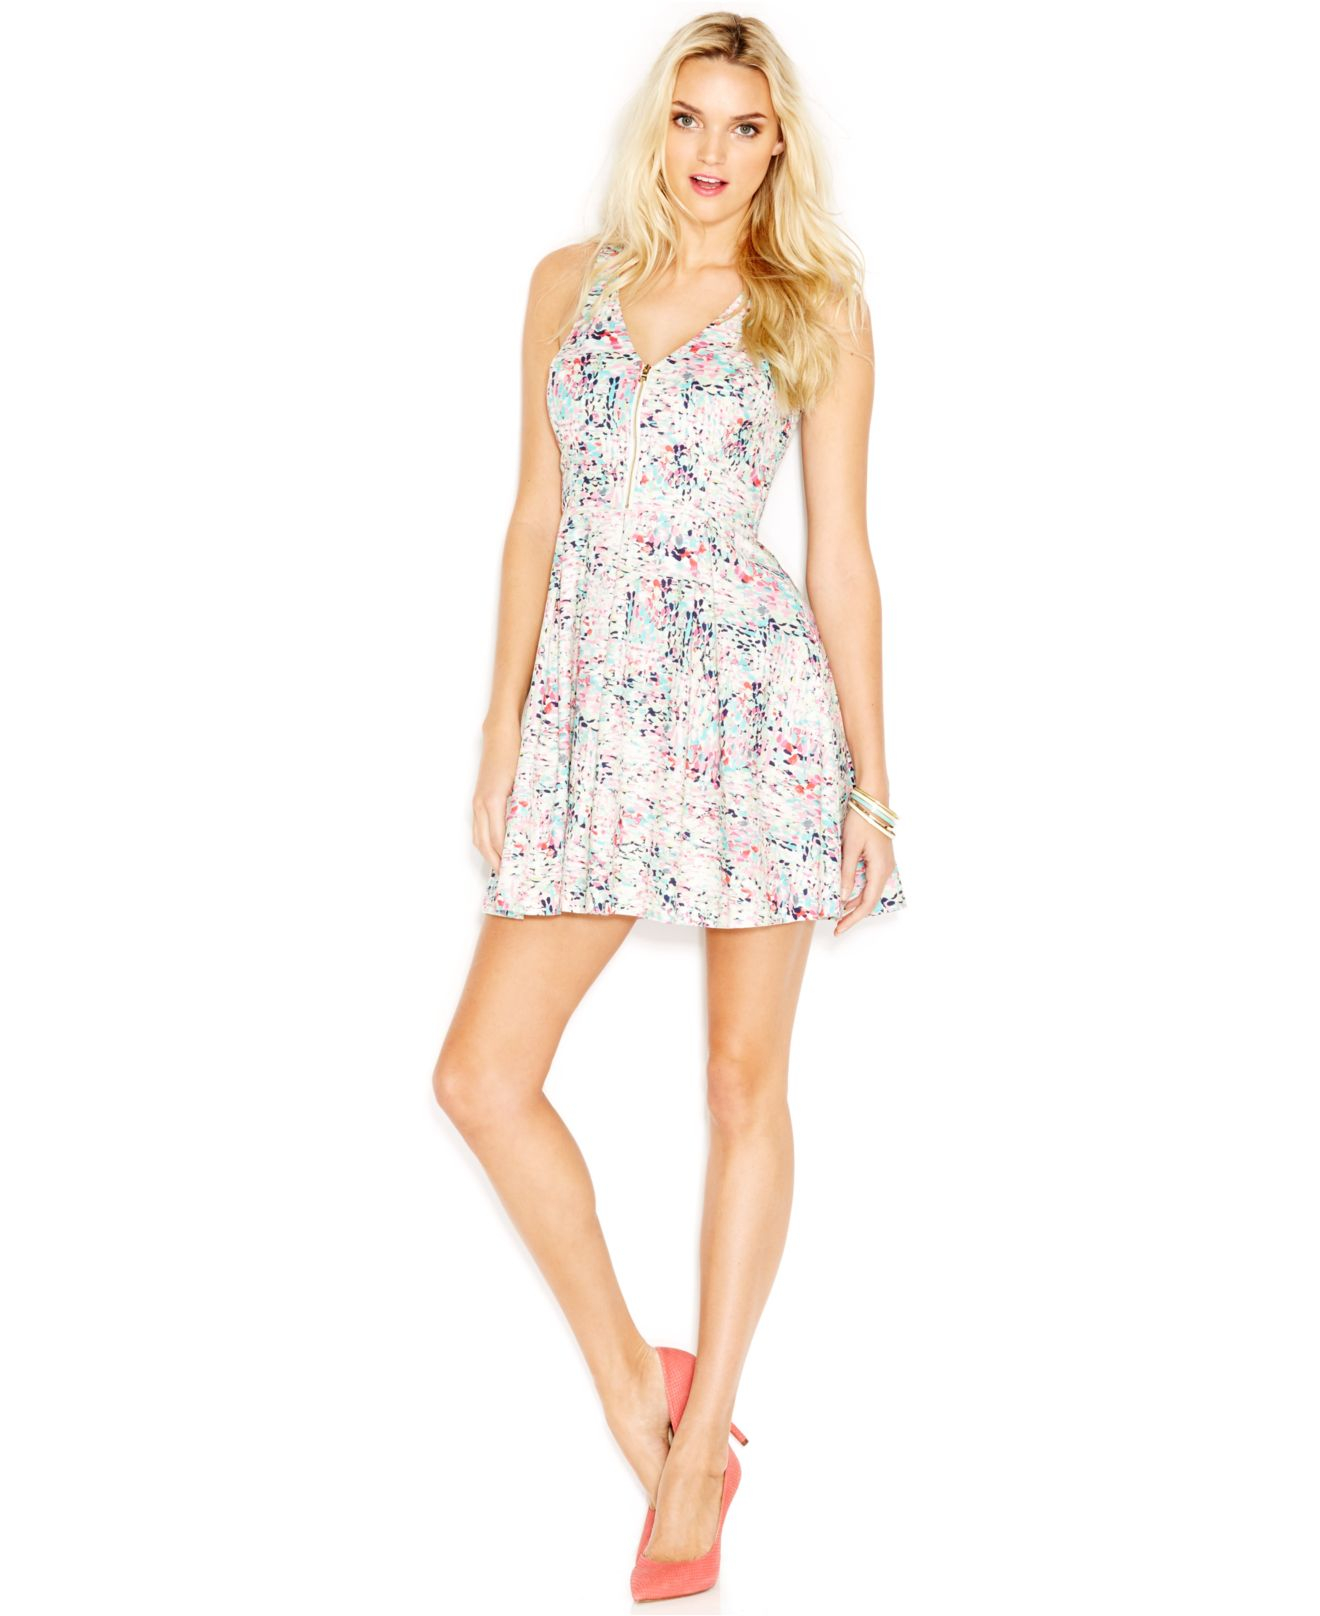 Guess Floral Print Zip Front Dress Lyst